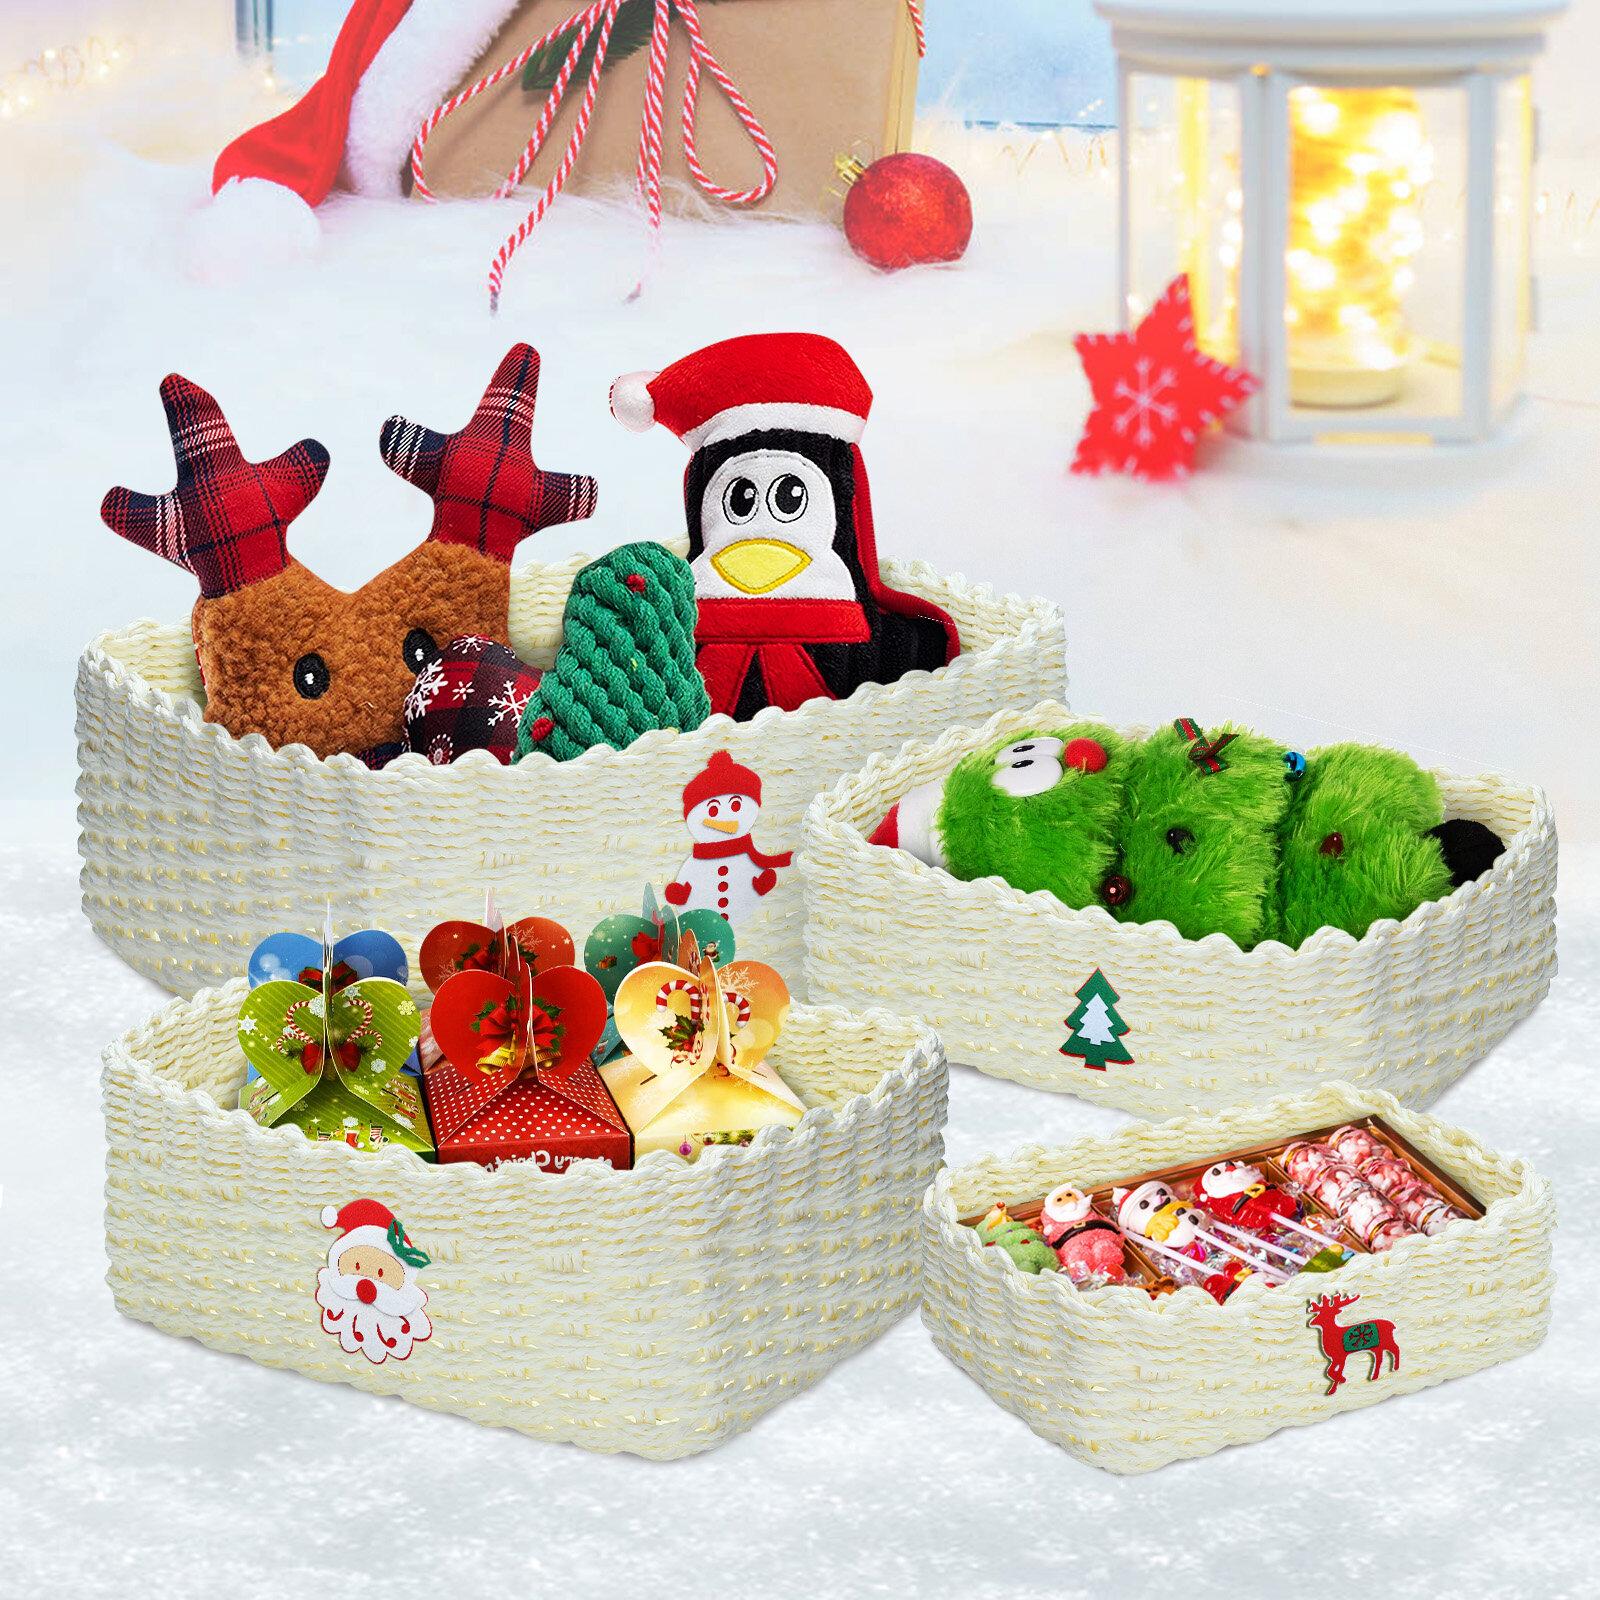 KING DO WAY 4PCS Christmas Handmade Woven Storage Basket Set Durable Eco-friendly Storage Basket